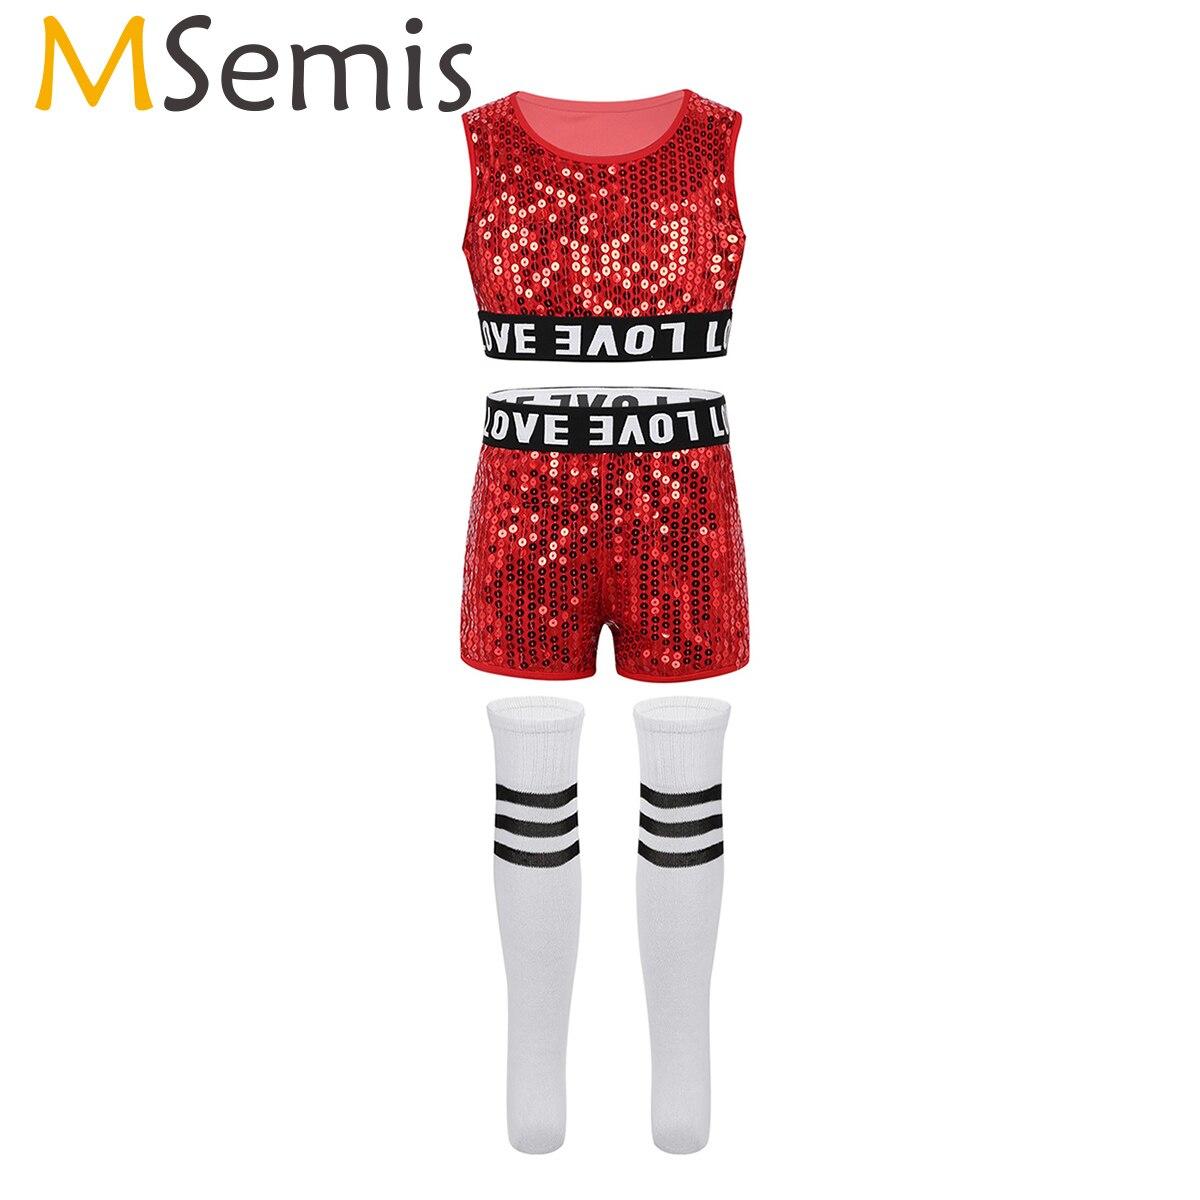 Children Kids Ballroom Jazz Street Hip Hop Dance Costumes Clothes Outfit Teens Girls Boys Sequins Crop Top Booty Shorts Socks